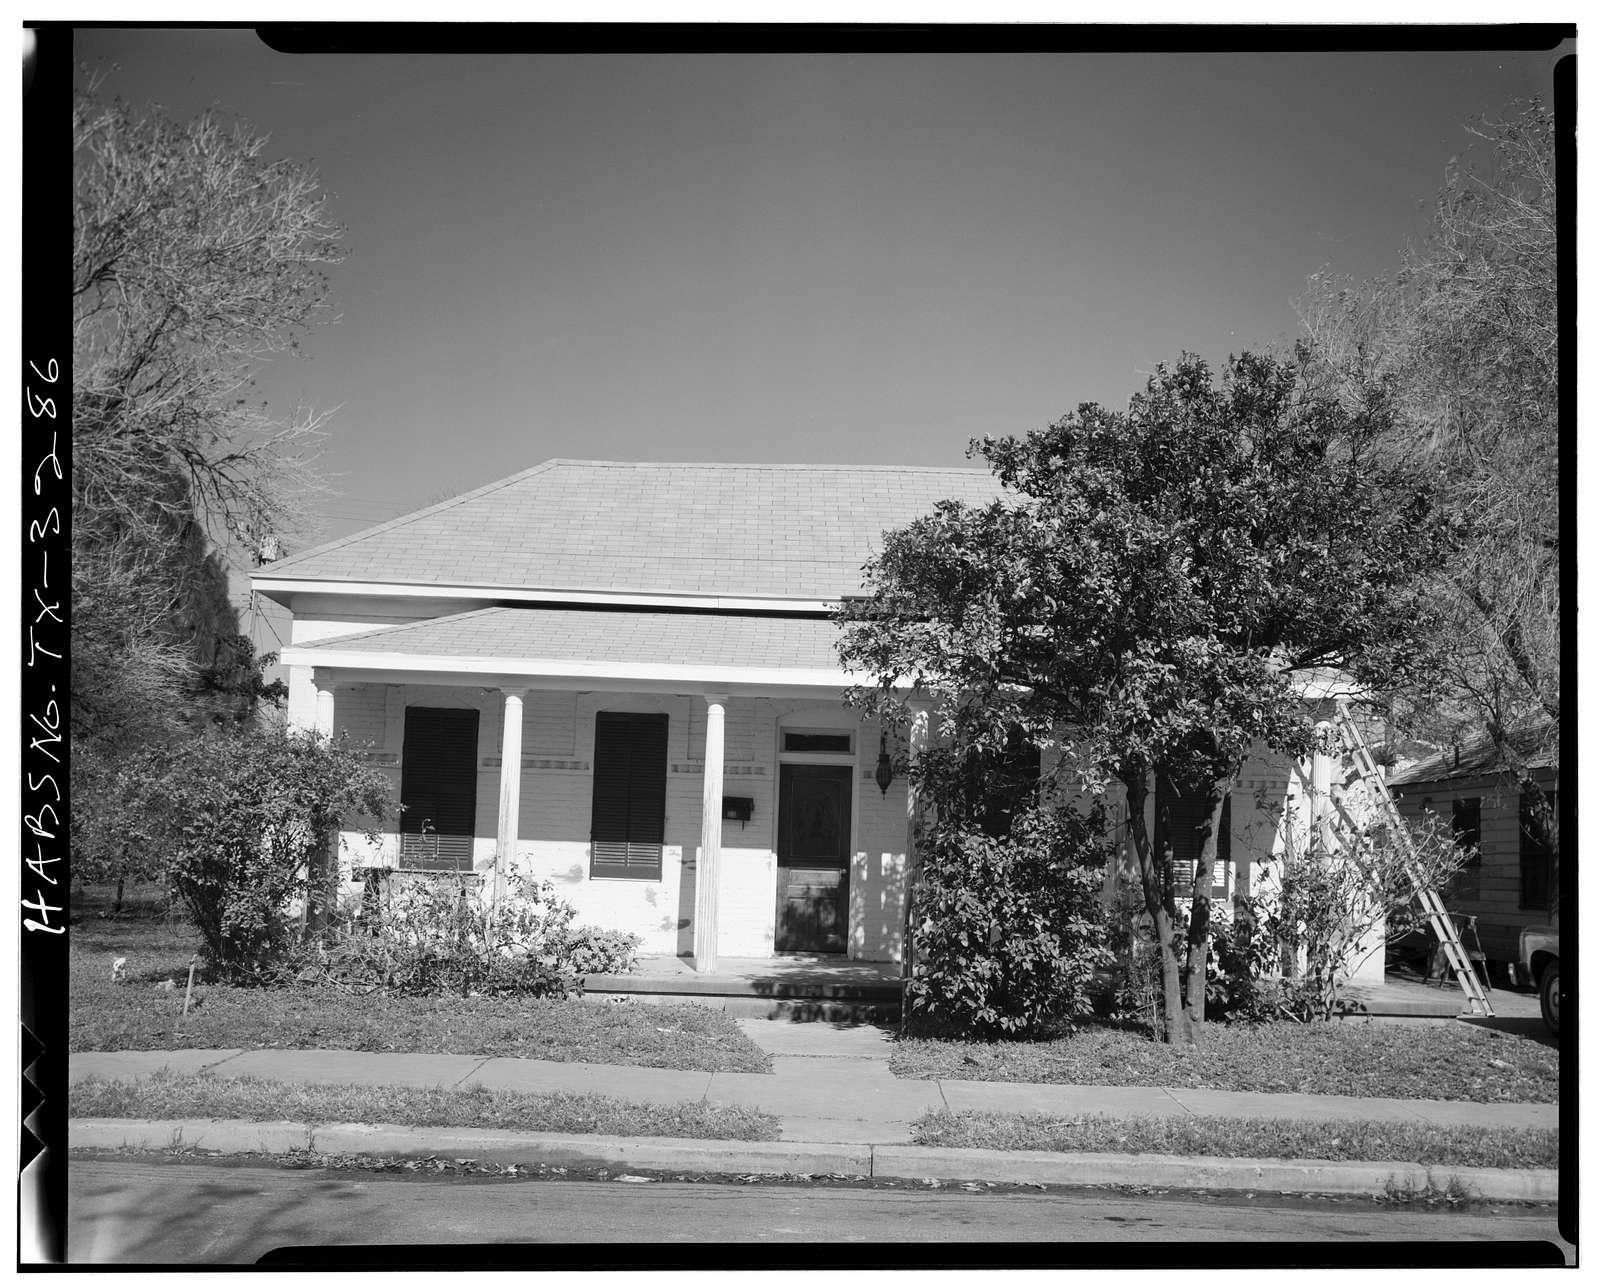 Tomas Tijerina House, 333 East Adams Street, Brownsville, Cameron County, TX